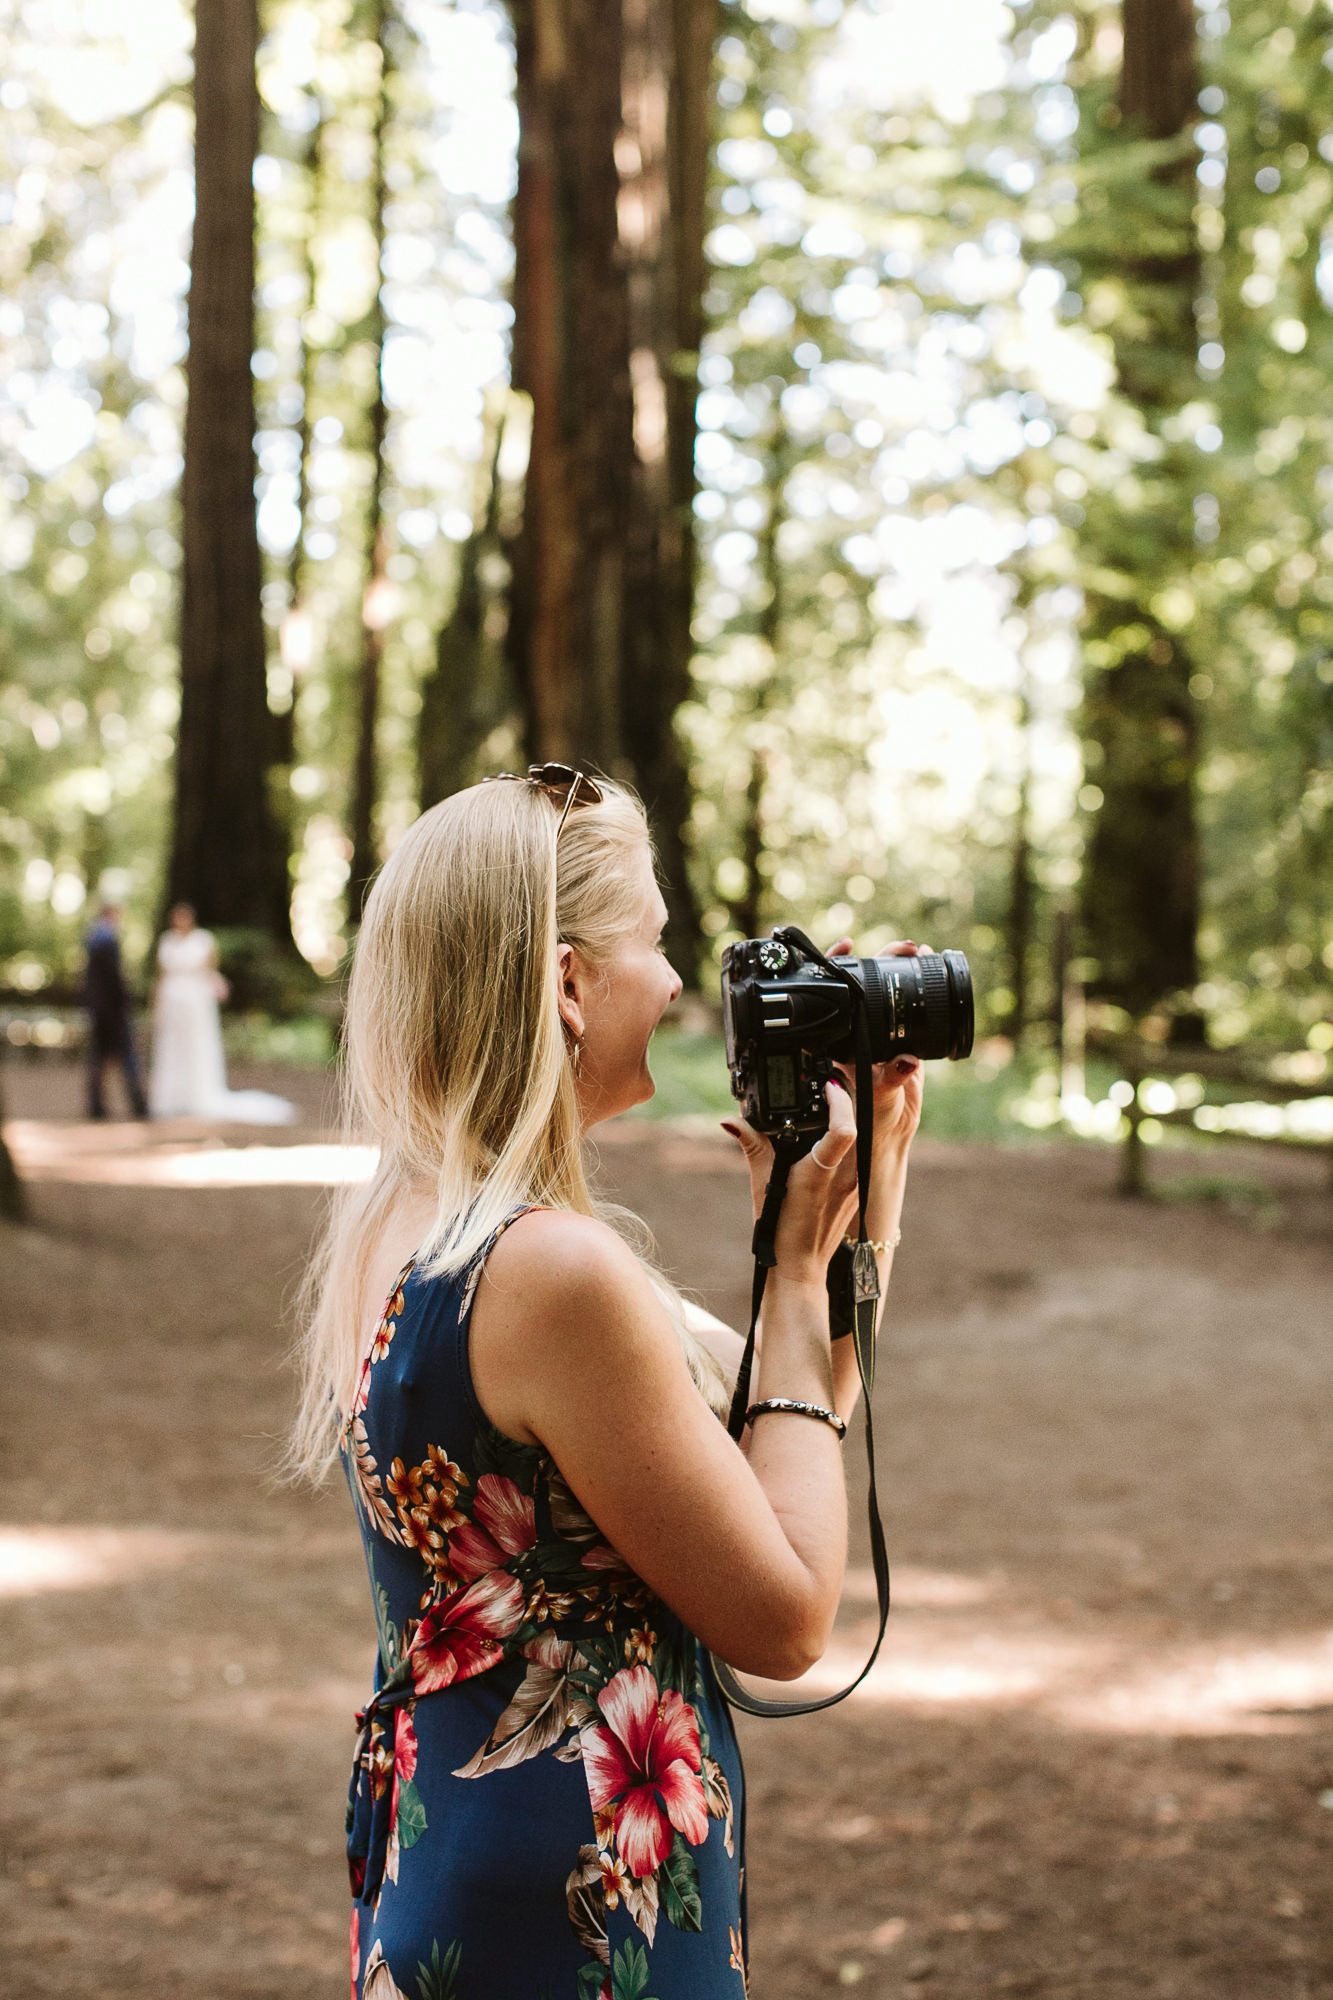 California-wedding-photographer-alfonso-flores-pamplin-groove-244.jpg